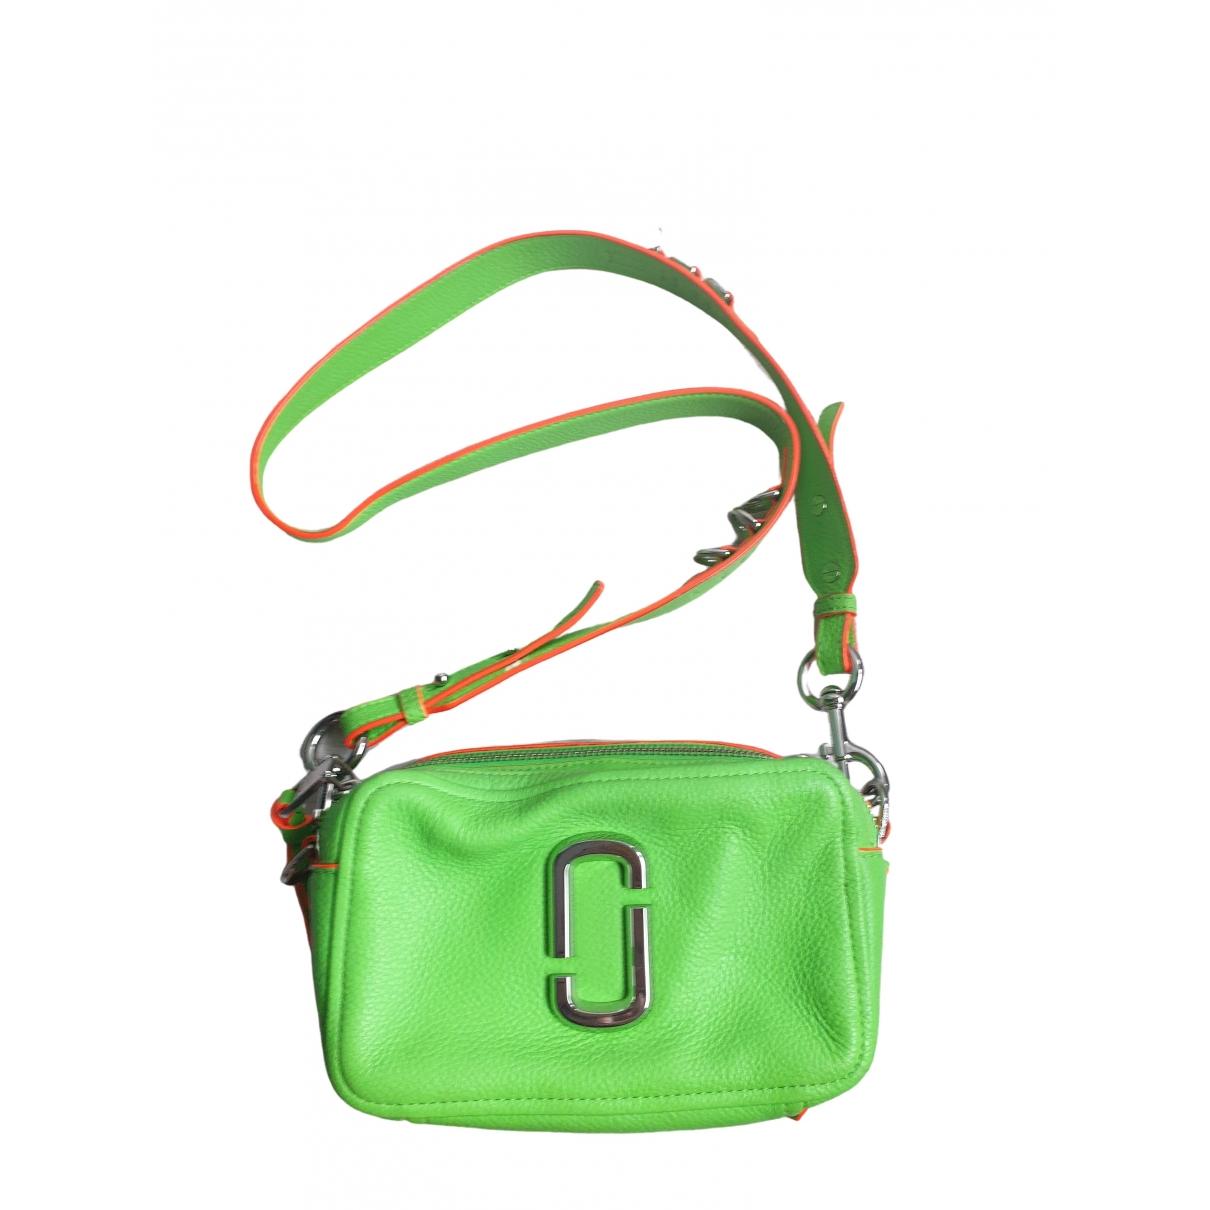 Marc Jacobs \N Green Leather handbag for Women \N